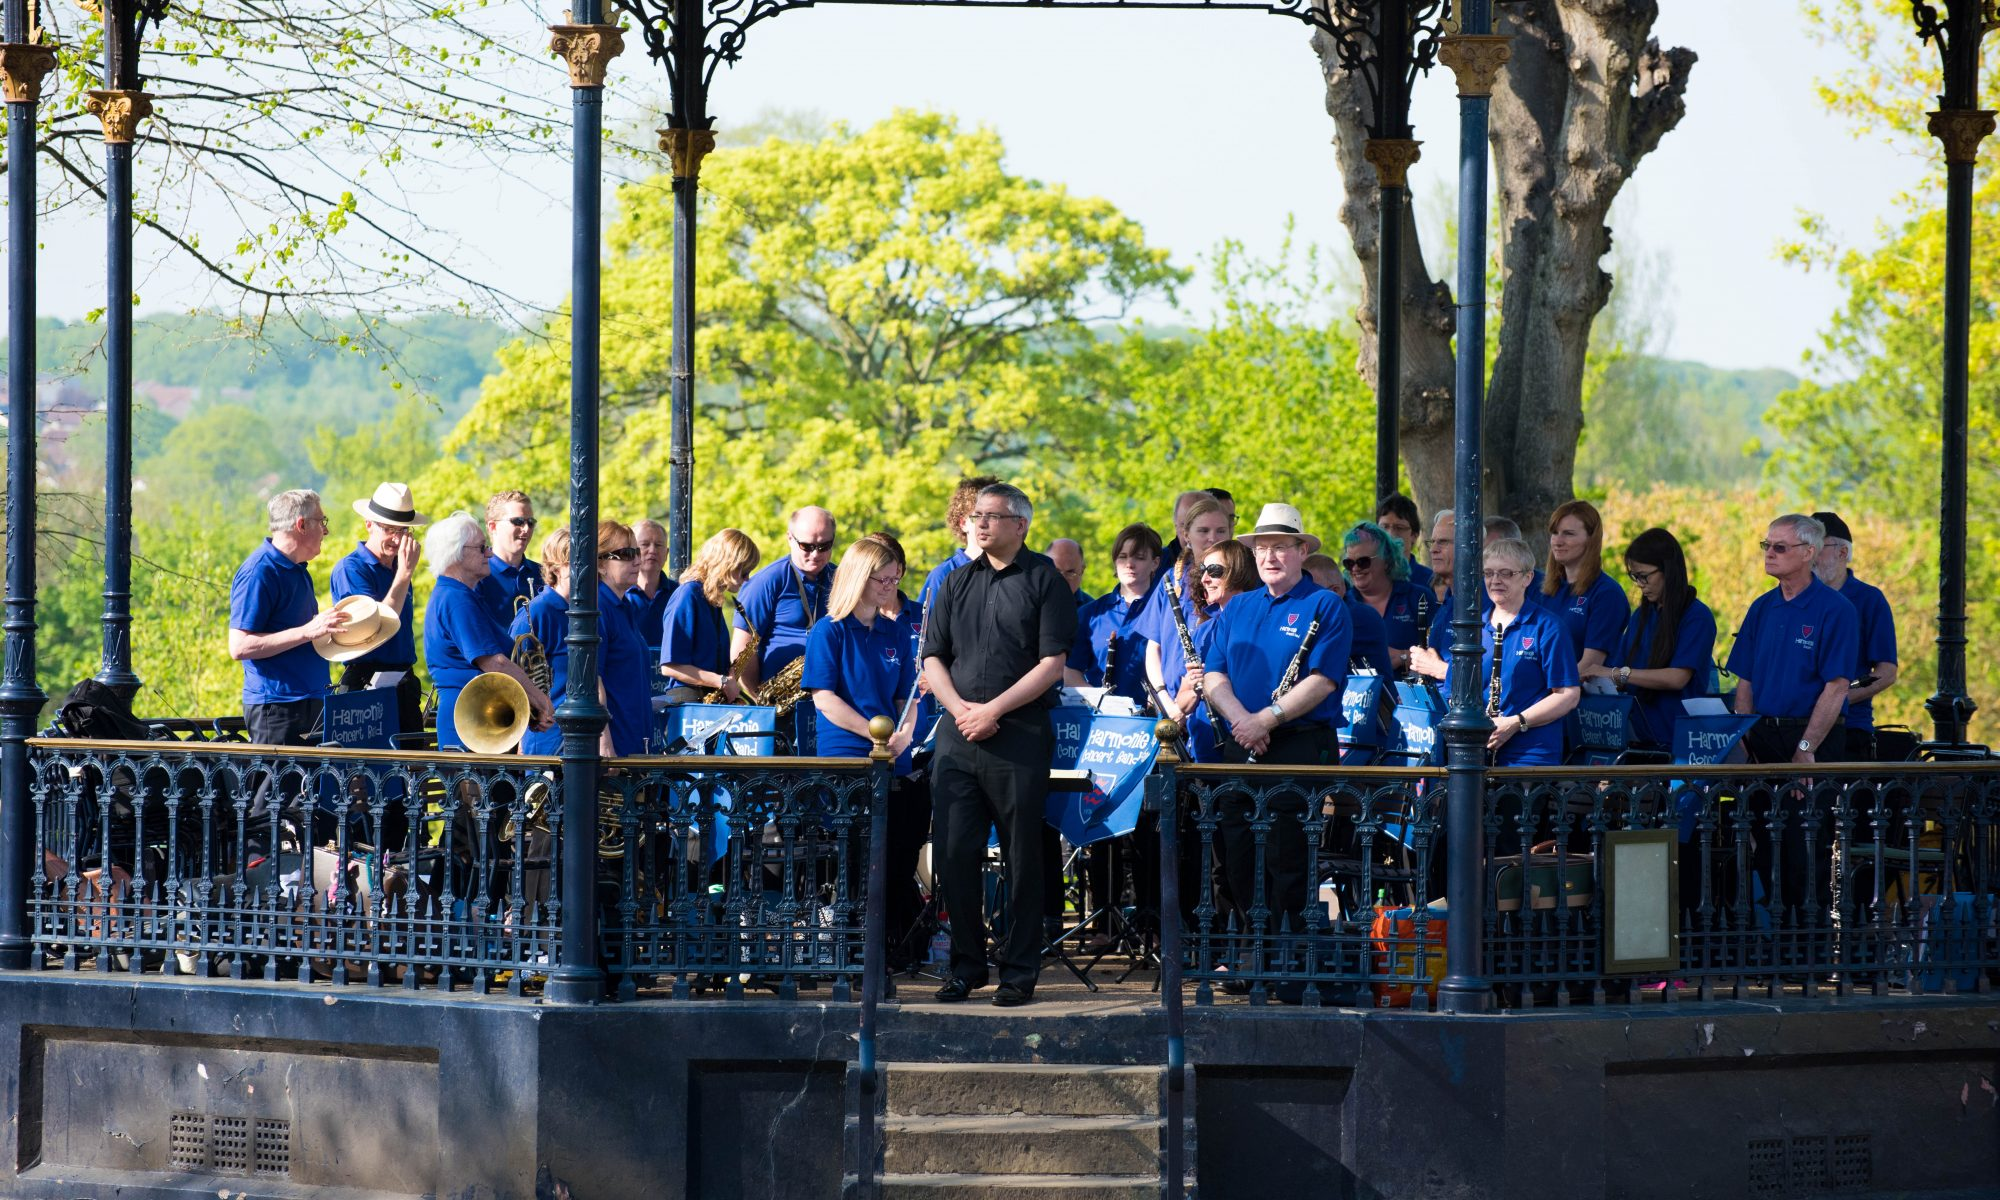 Harmonie Concert Band